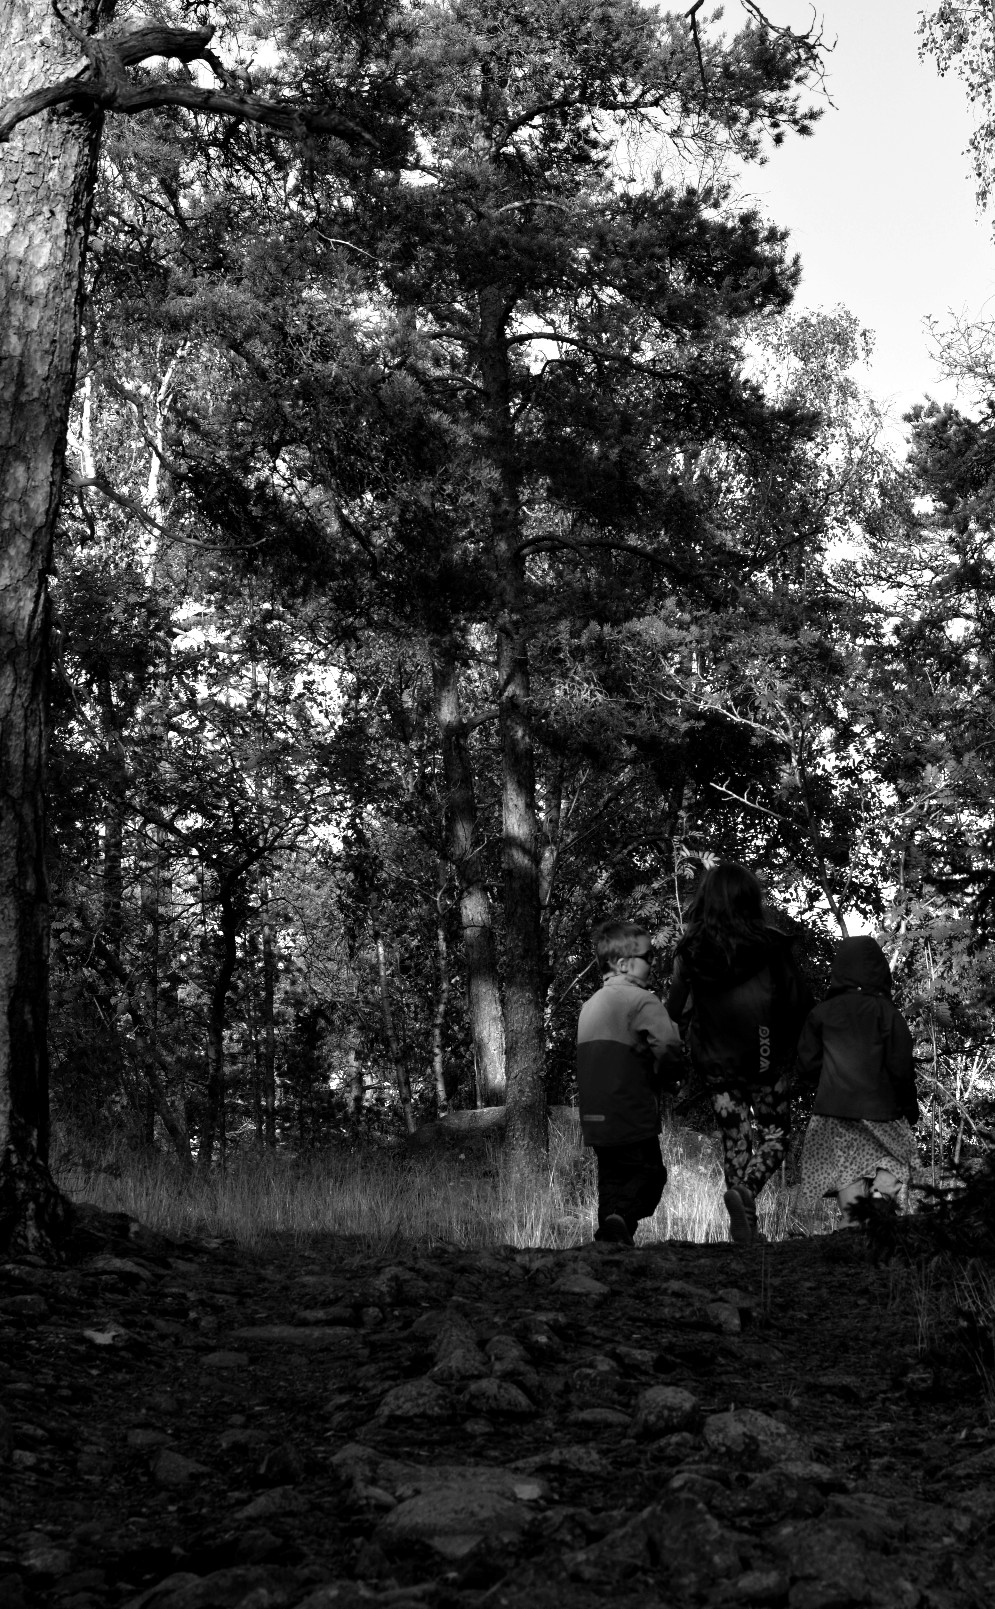 Svartvit tre barn går i skogen.